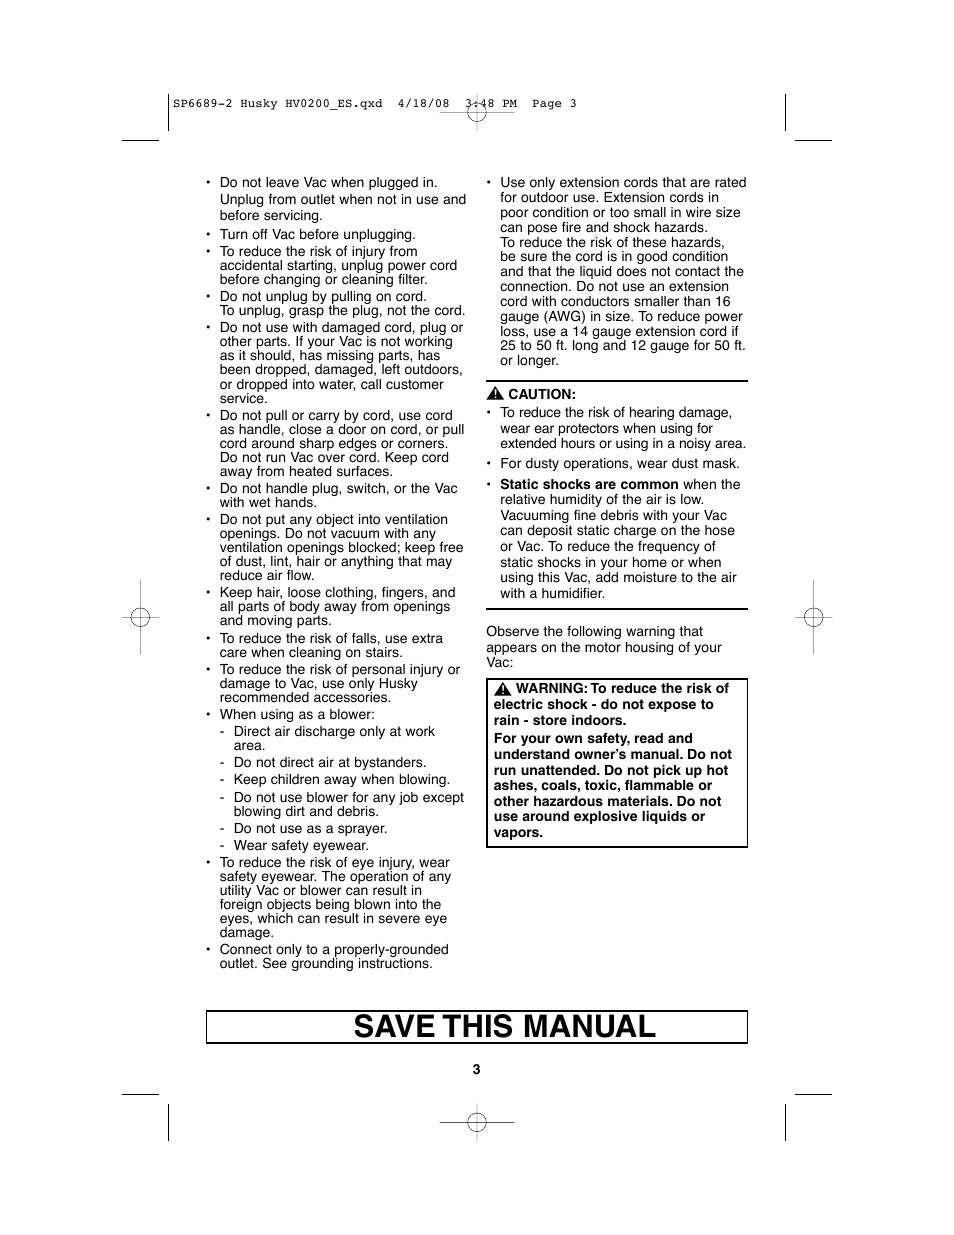 save this manual husky hv02000 user manual page 3 24 rh manualsdir com ezviz husky user manual husky owners manual